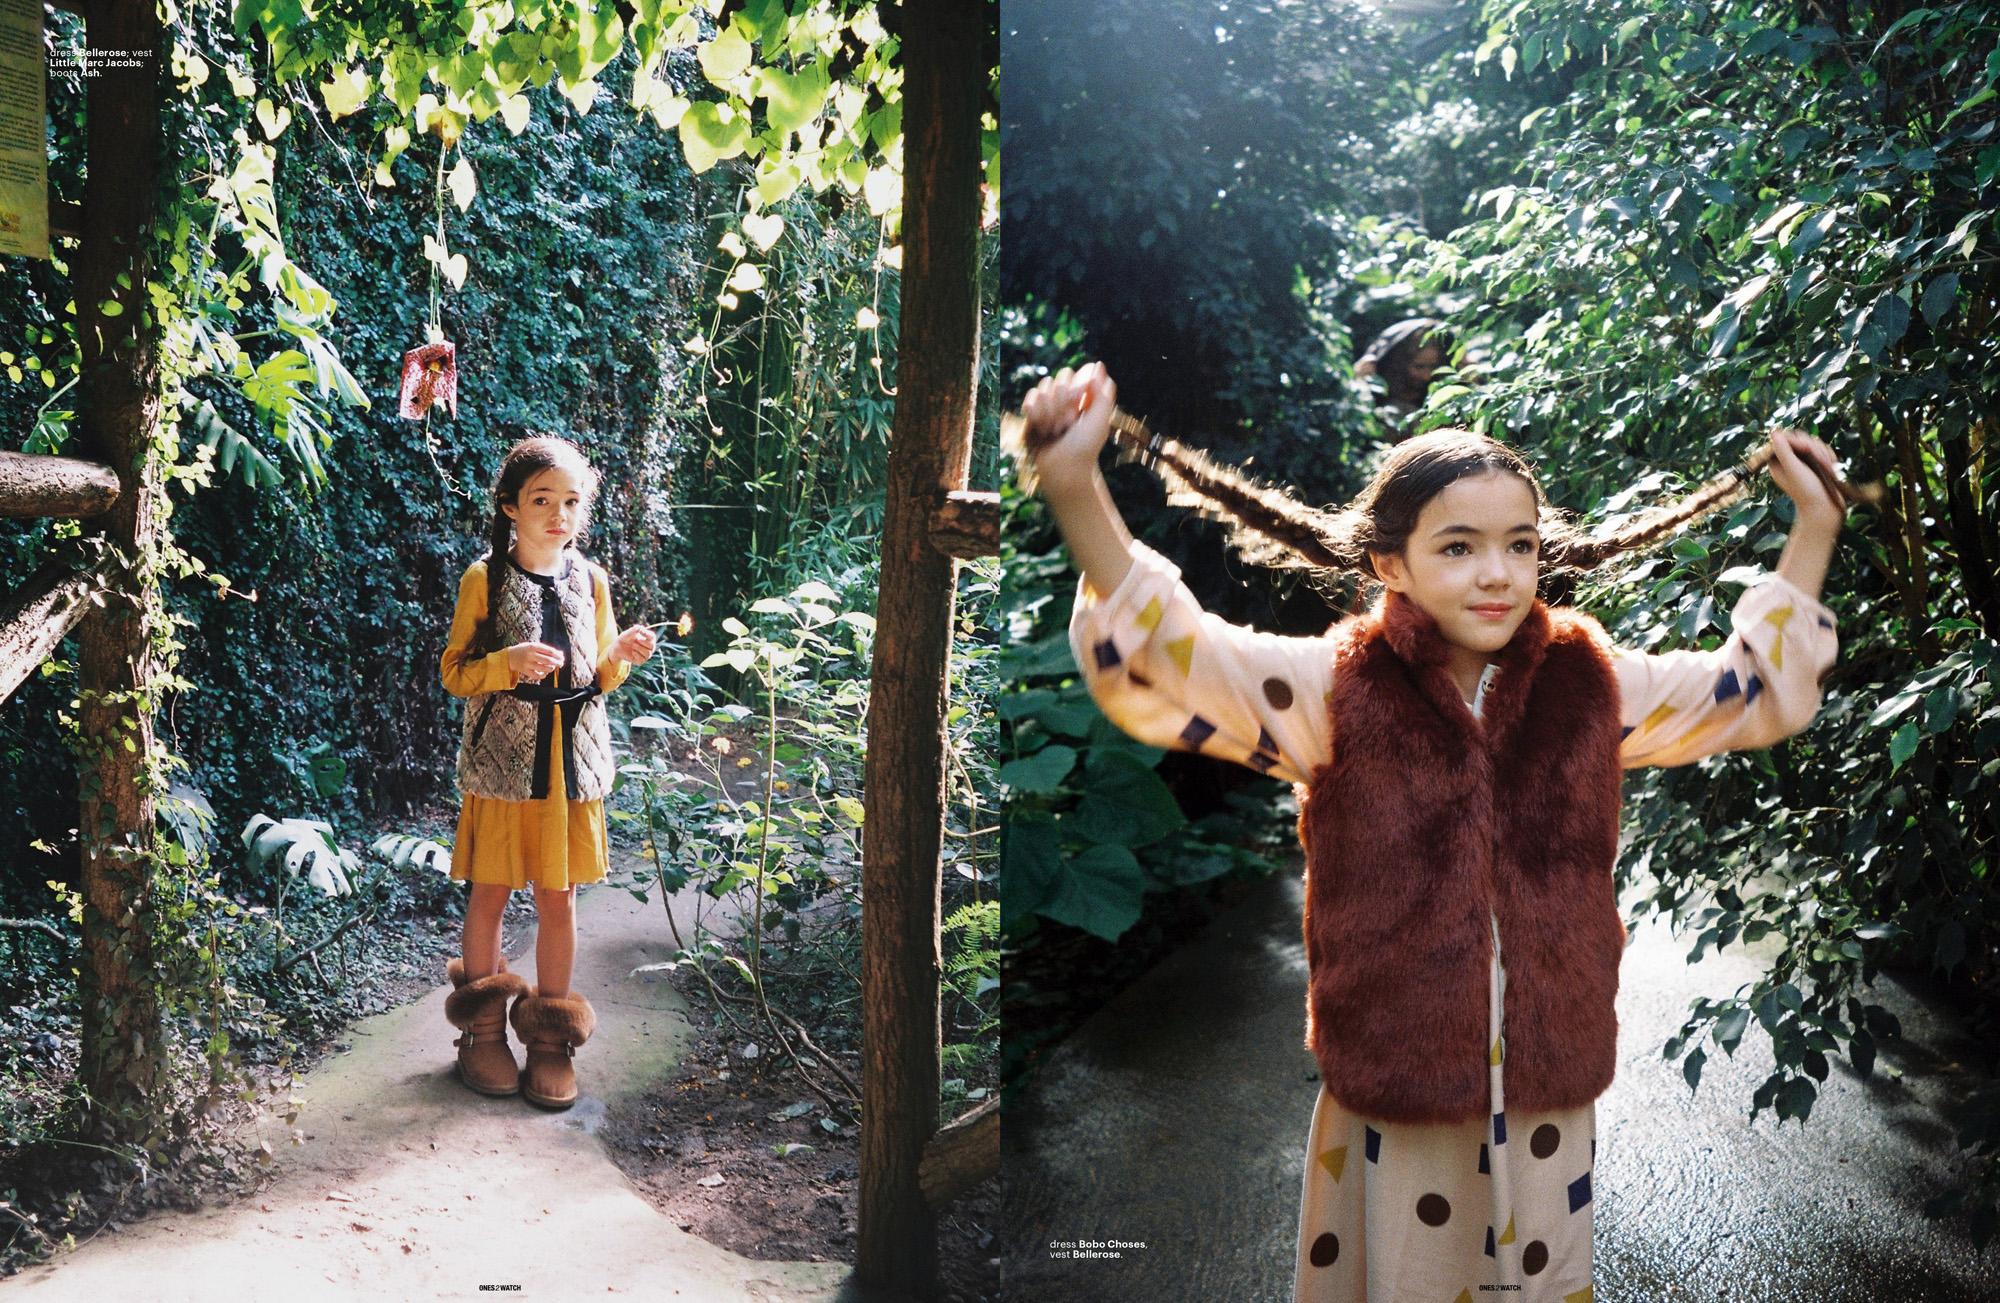 left: dress Bellerose; vest Little Marc Jacobs; boots Ash. | right: dress Bobo Choses, vest Bellerose.